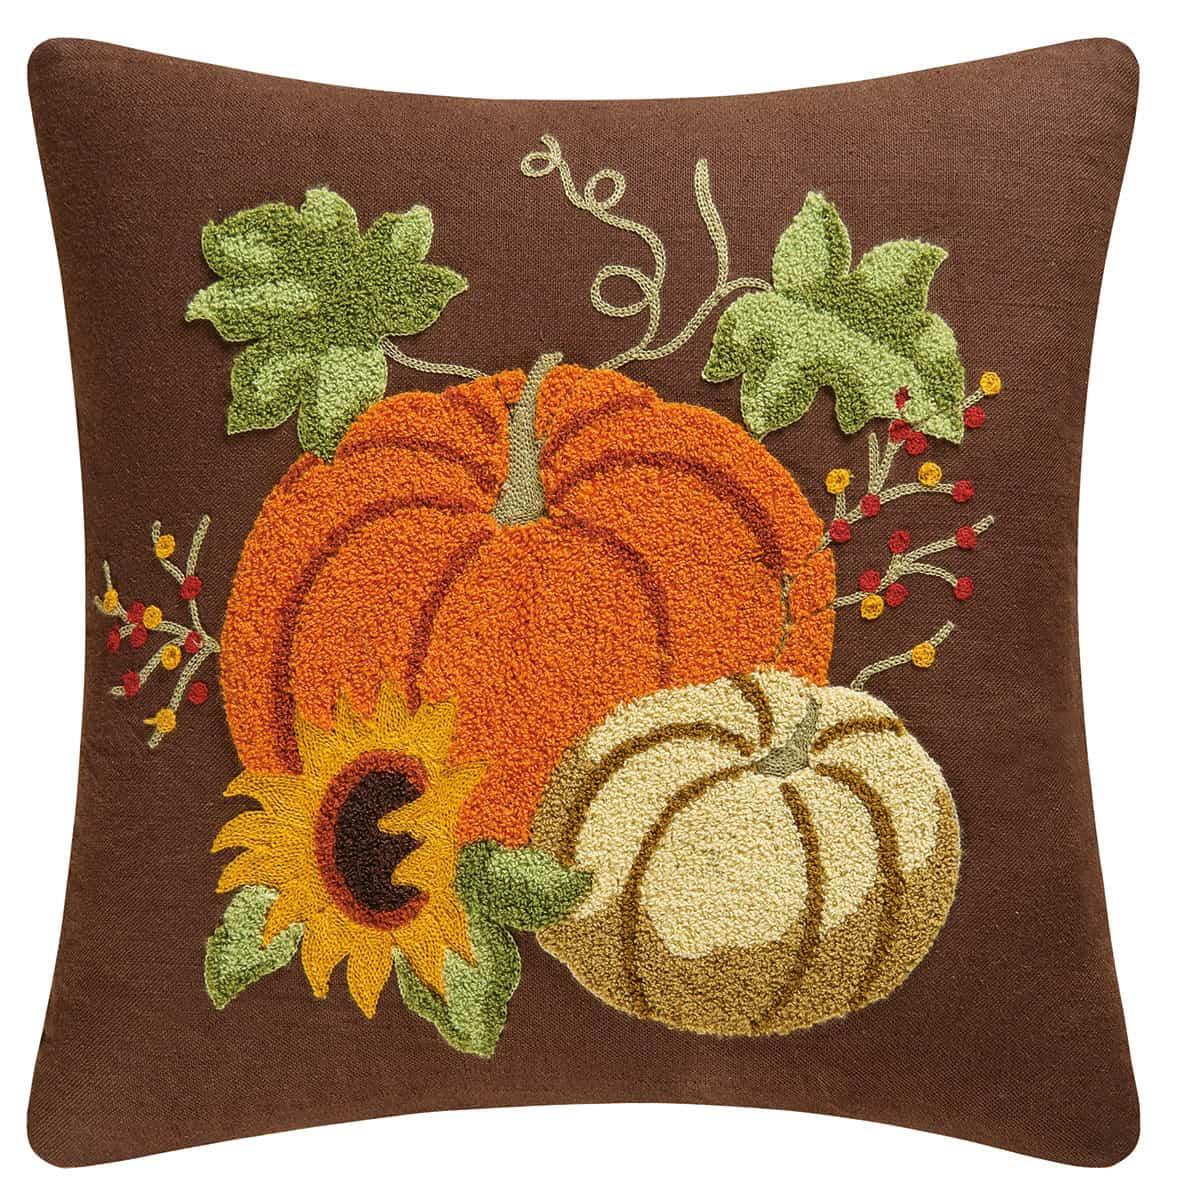 Decorative Pillows For Fall : 7 Fall Home Decor Pillows ? 3 Boys and a Dog